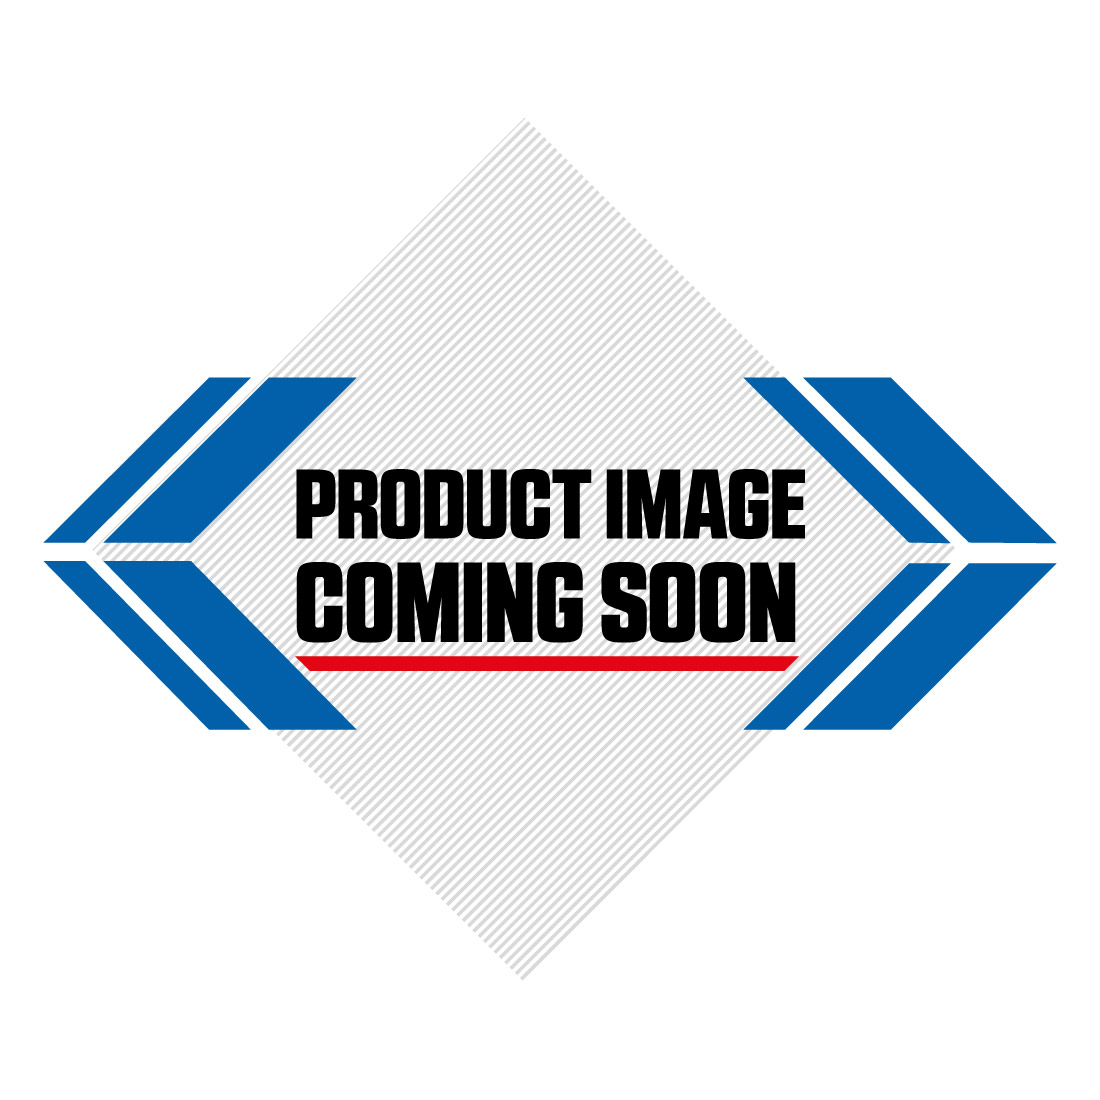 Renthal Twinring Rear Sprocket KTM SX SX-F EXC EXC-F Husqvarna TC FC TE FE - Black